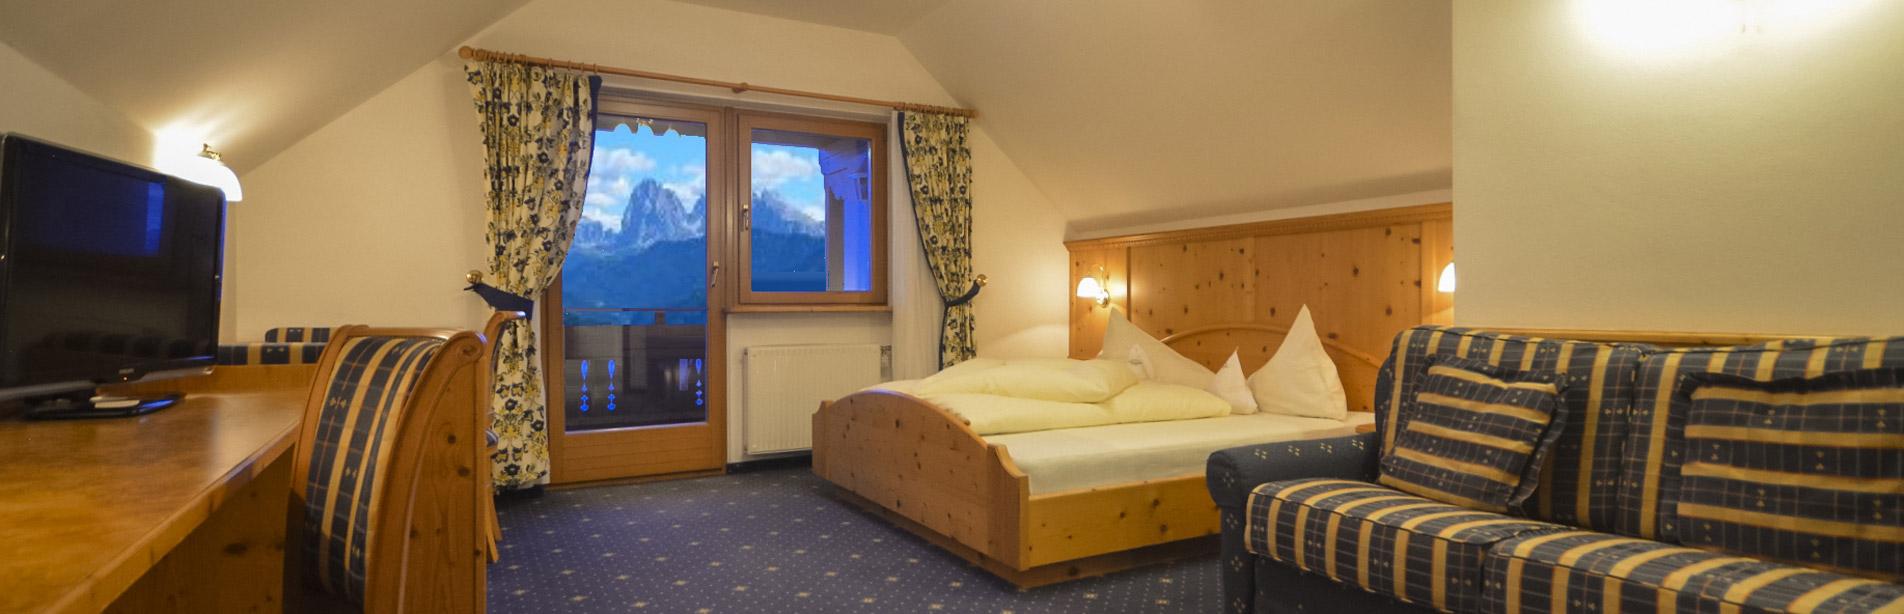 Hotel Sambergerhof  royal-neu